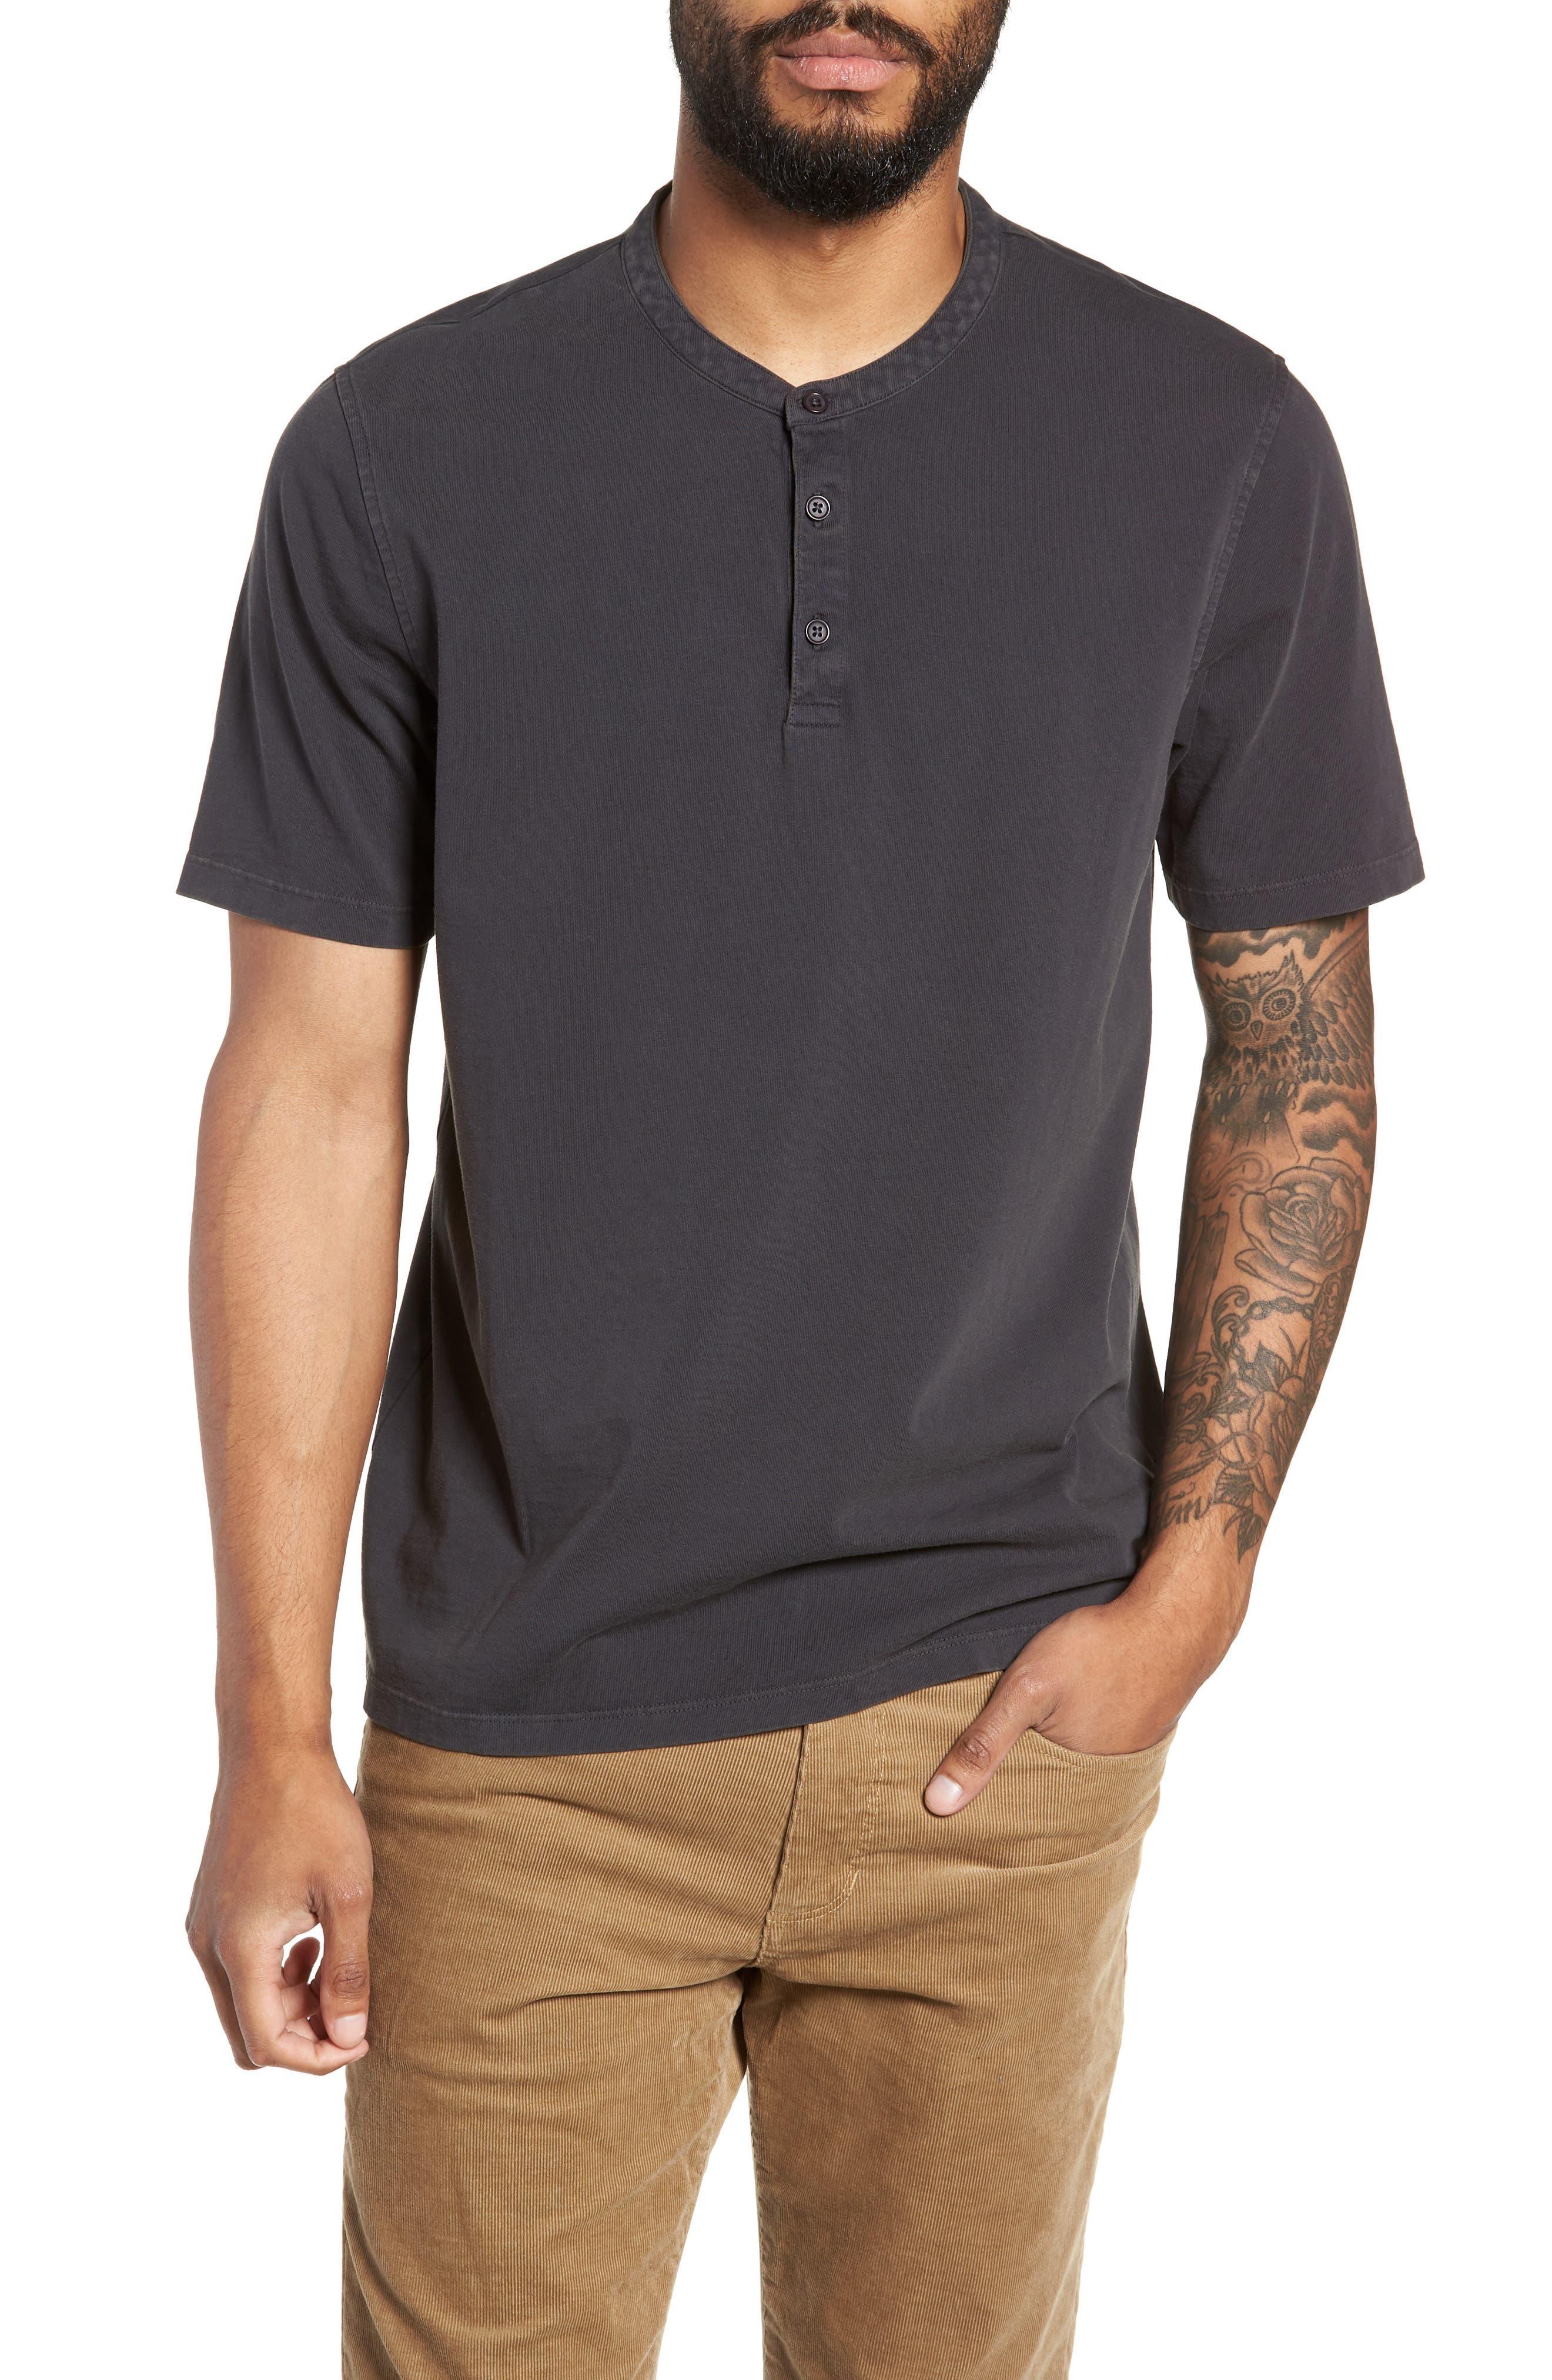 VINCE Regular Fit Garment Dye Short Sleeve Henley, Main, color, 001